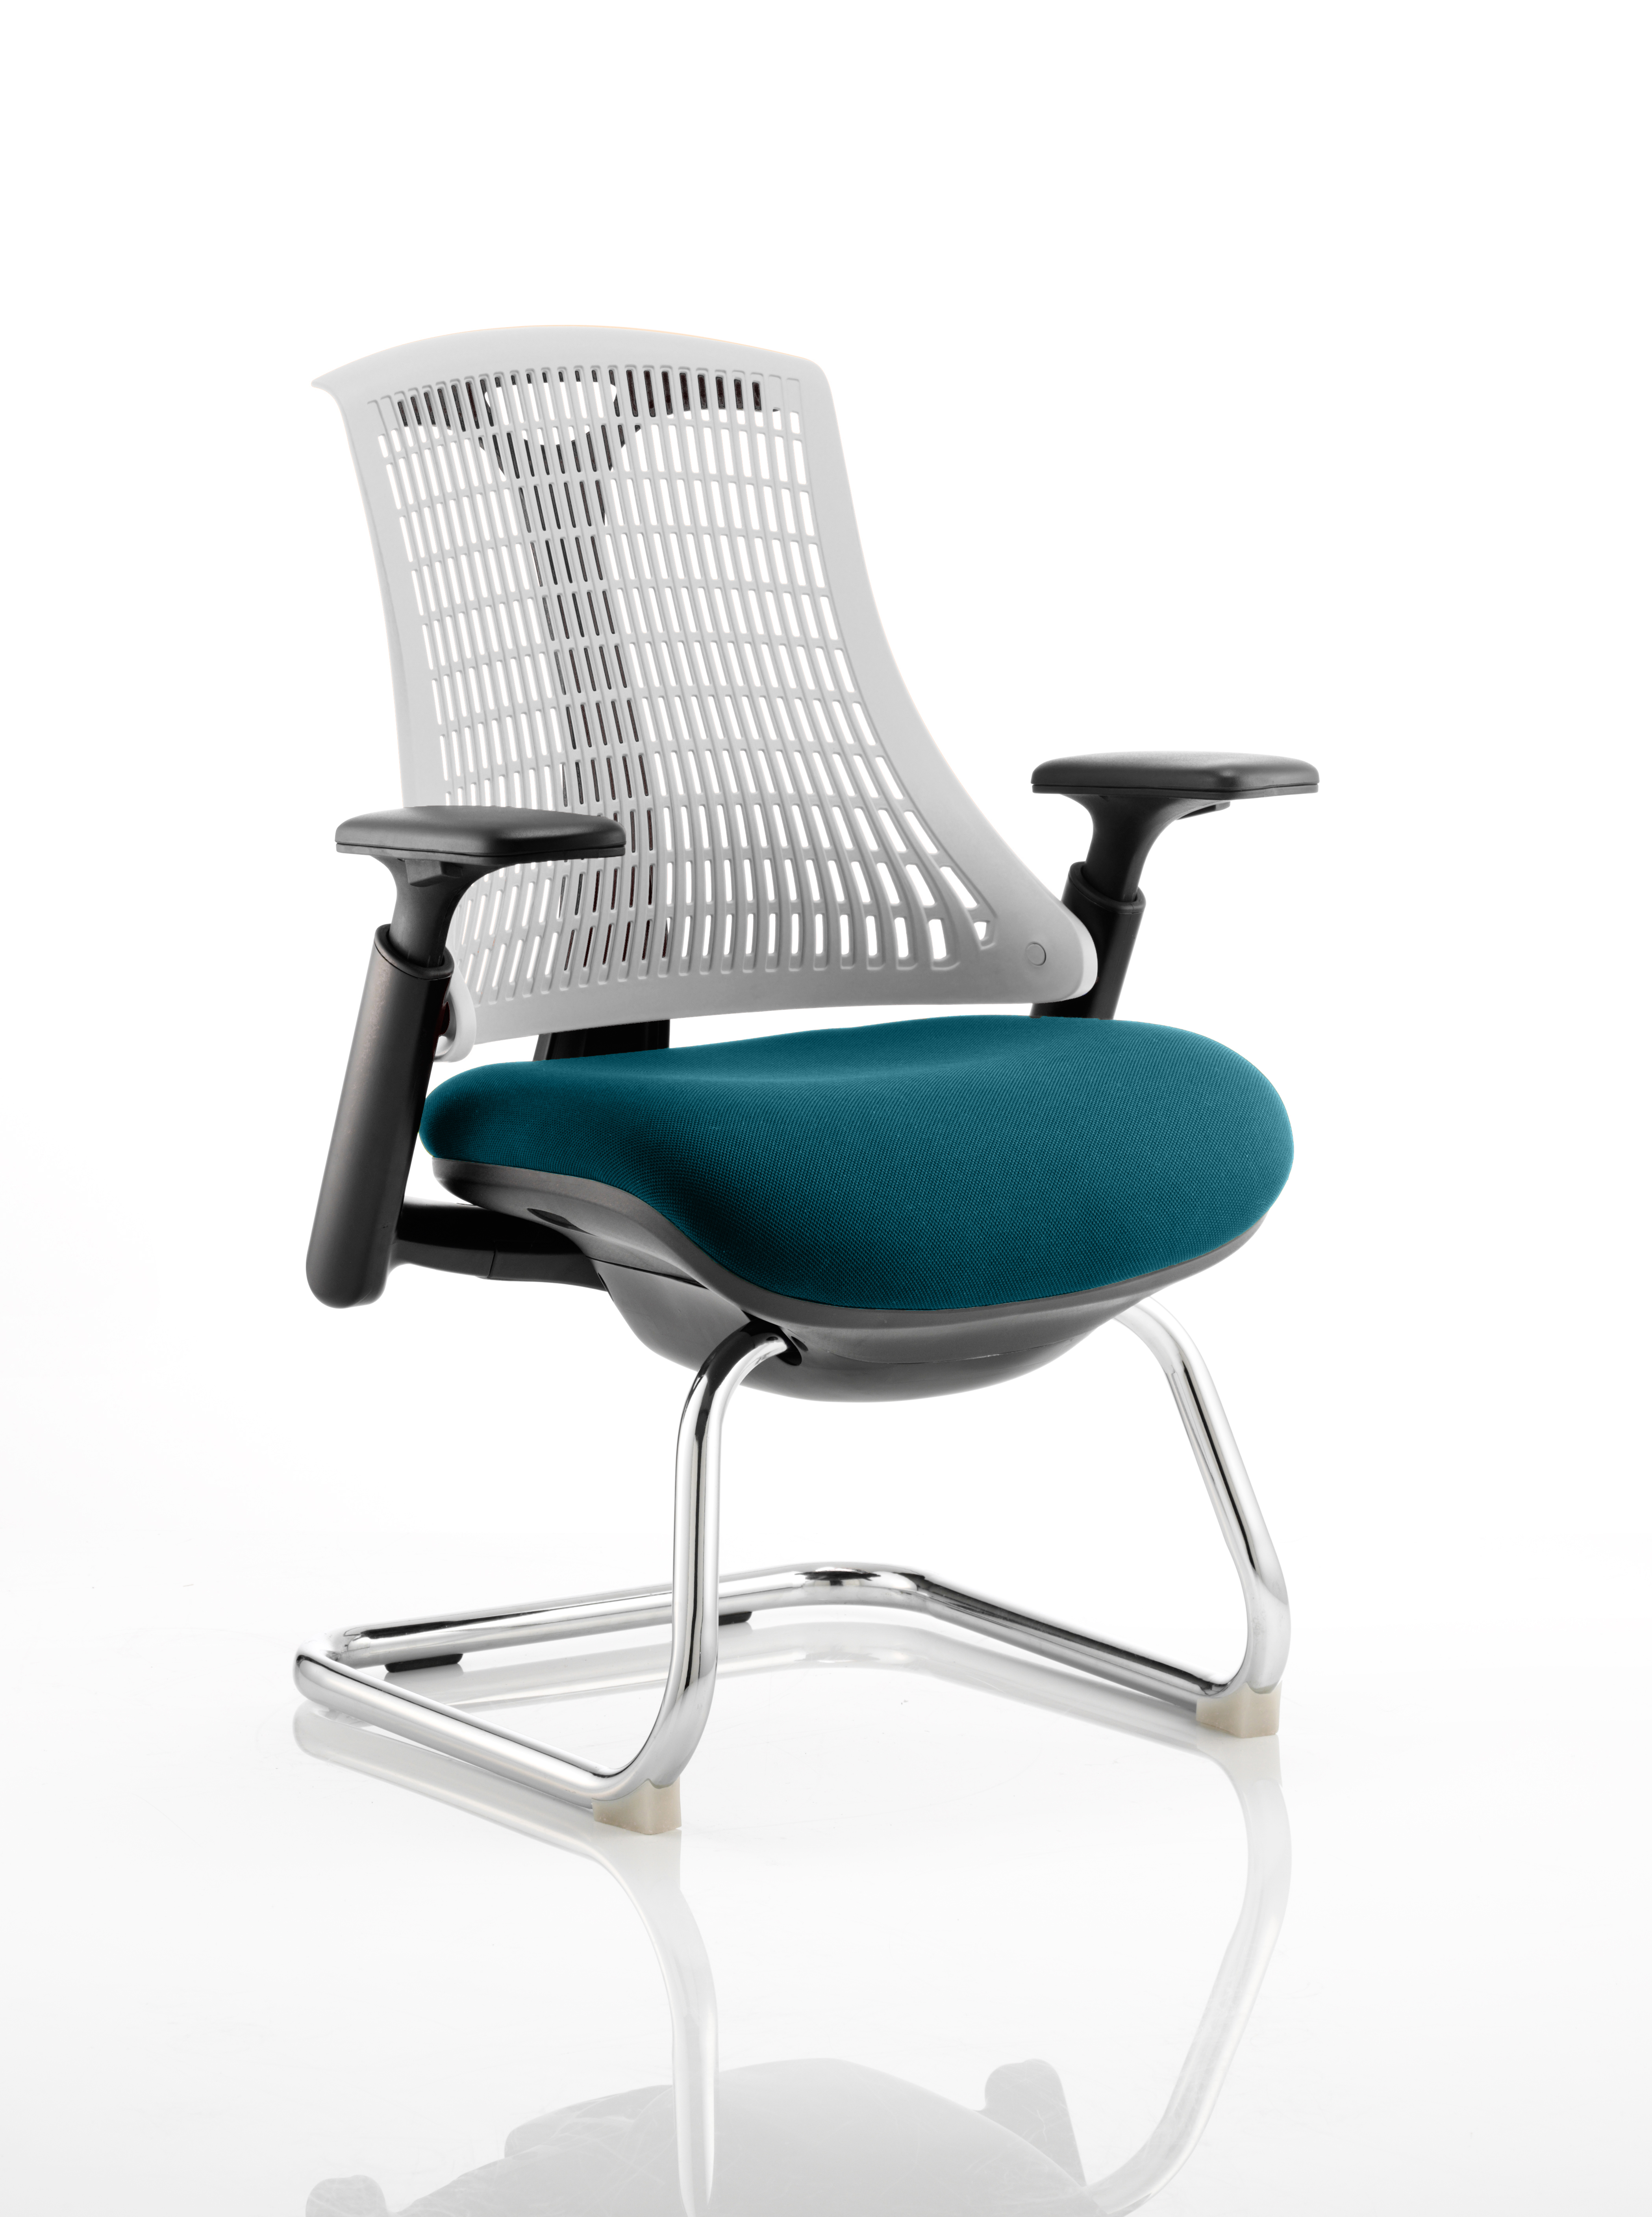 Flex Cantilever Chair Black Frame White Back Bespoke Colour Seat Maringa Teal